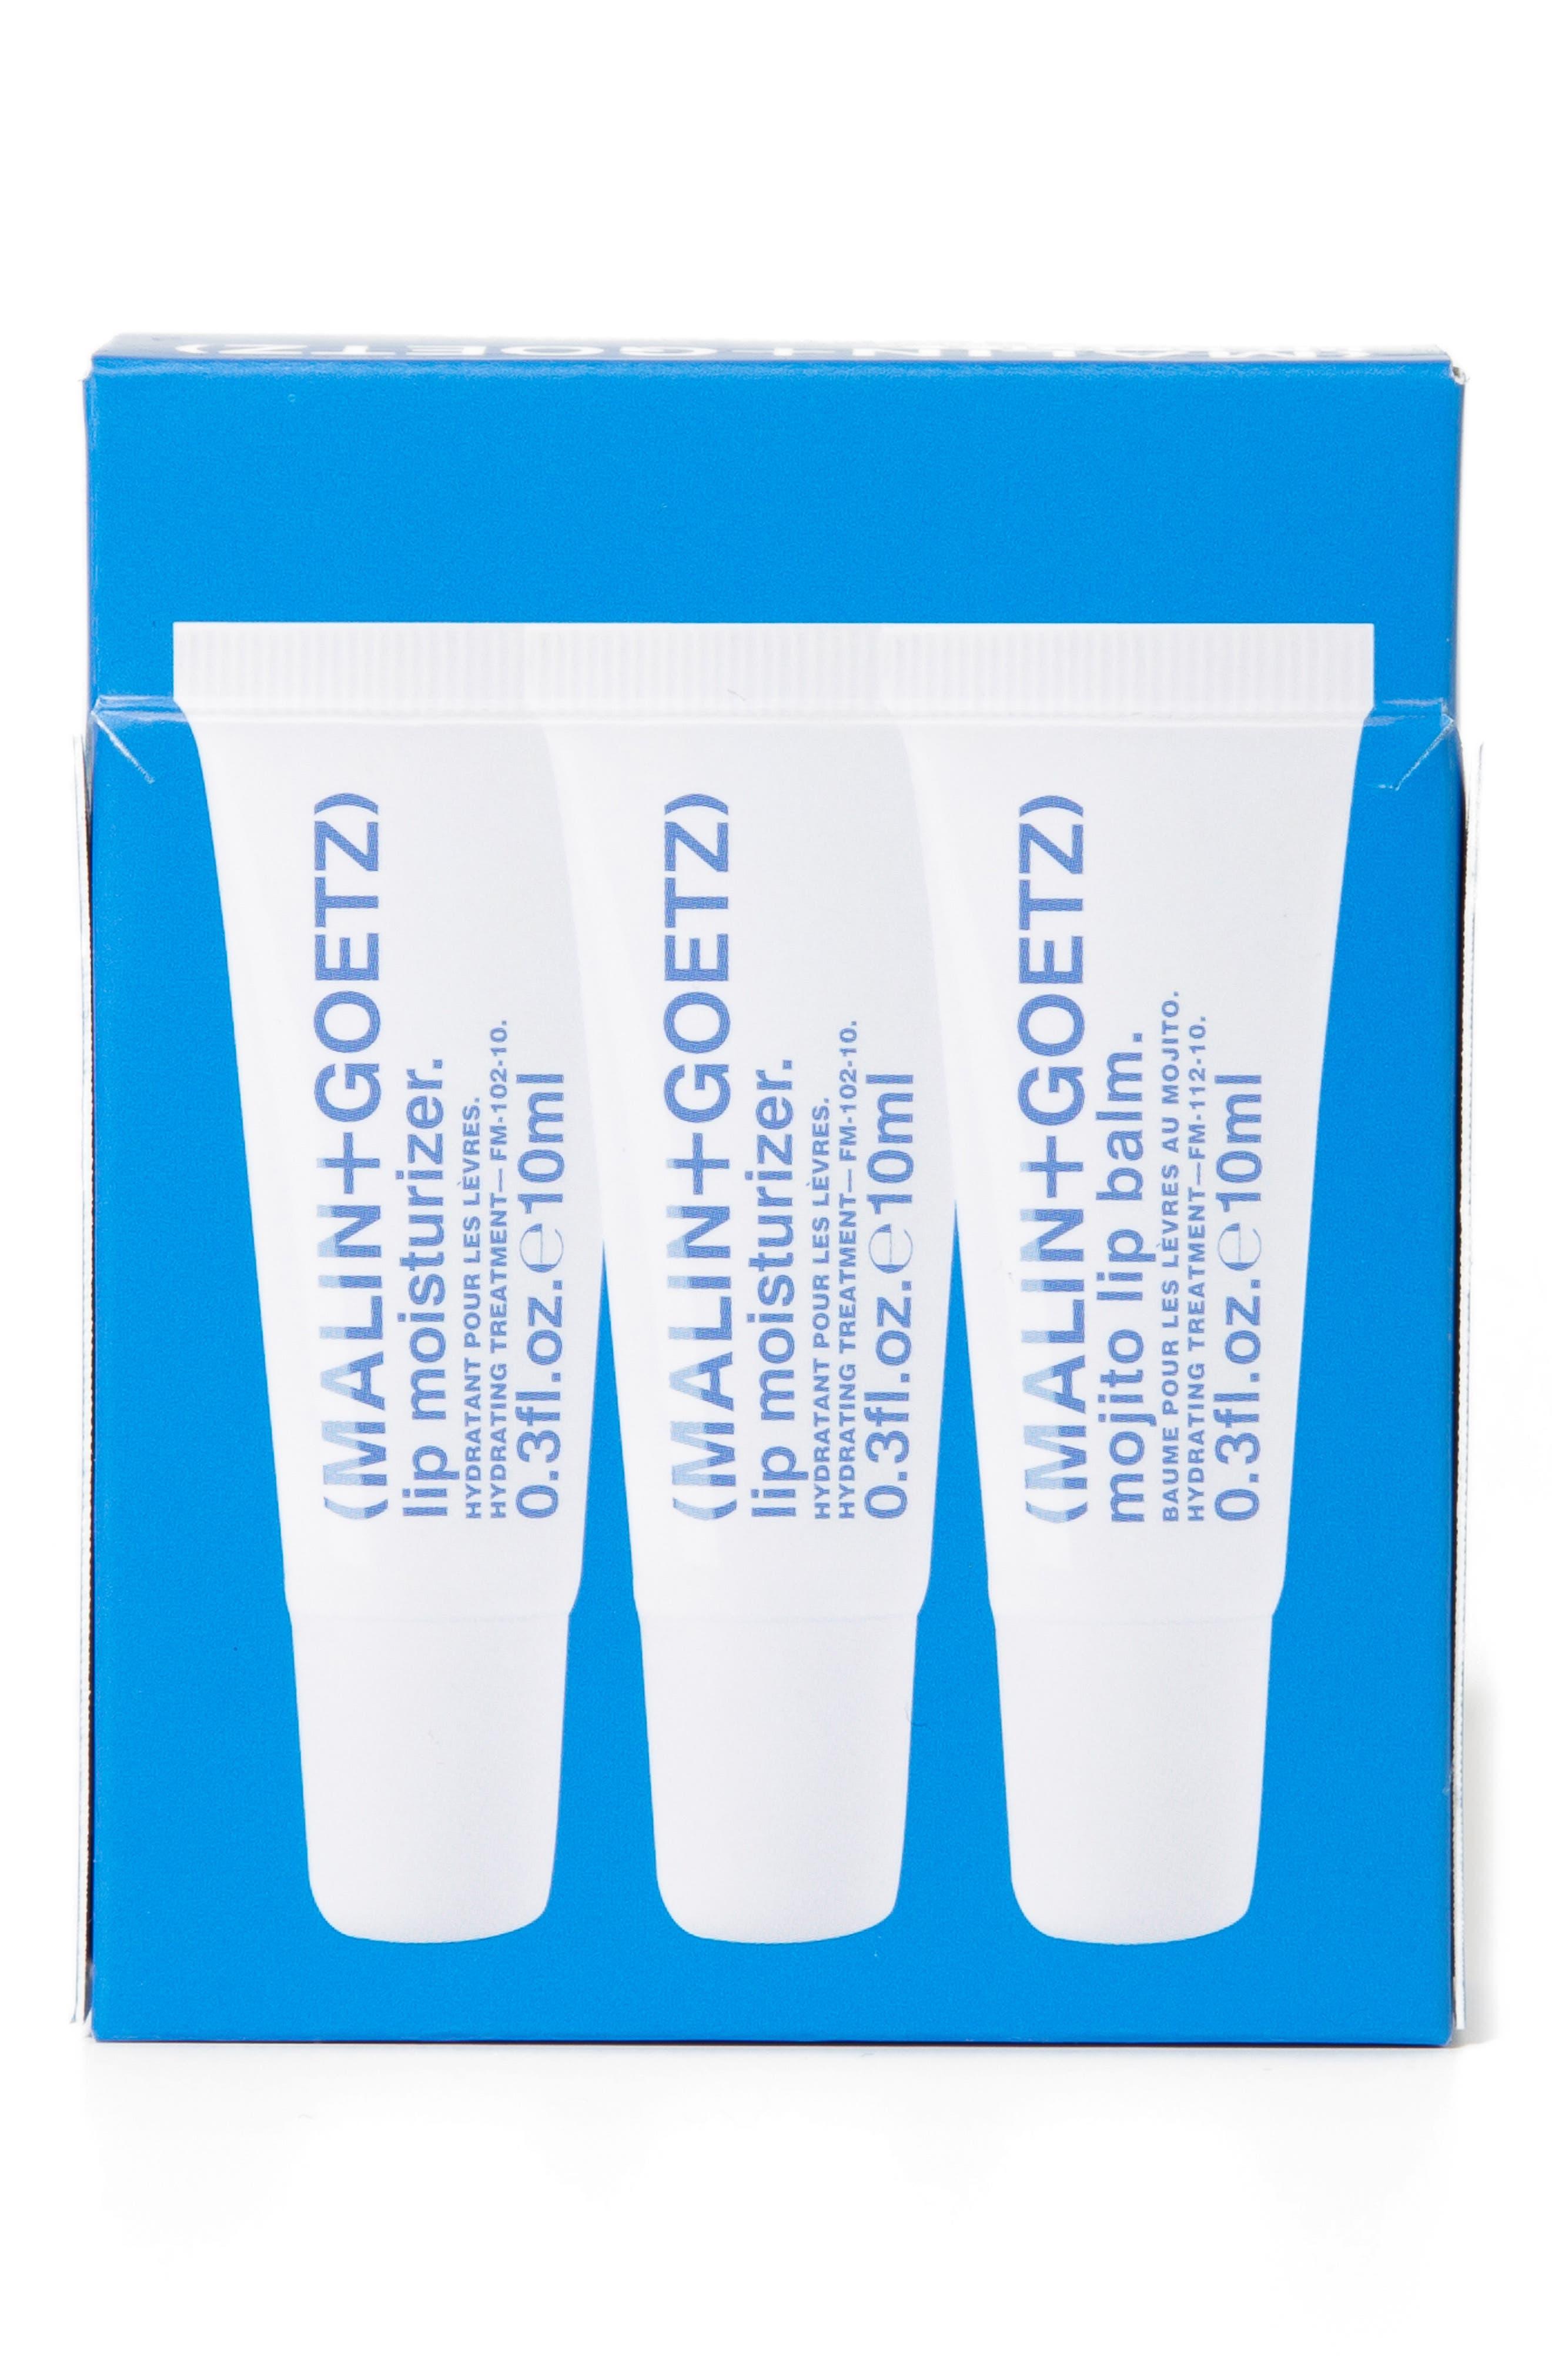 Malin+Goetz Lip Service Full Size Lip Moisturizer & Balm Trio-$42 Value